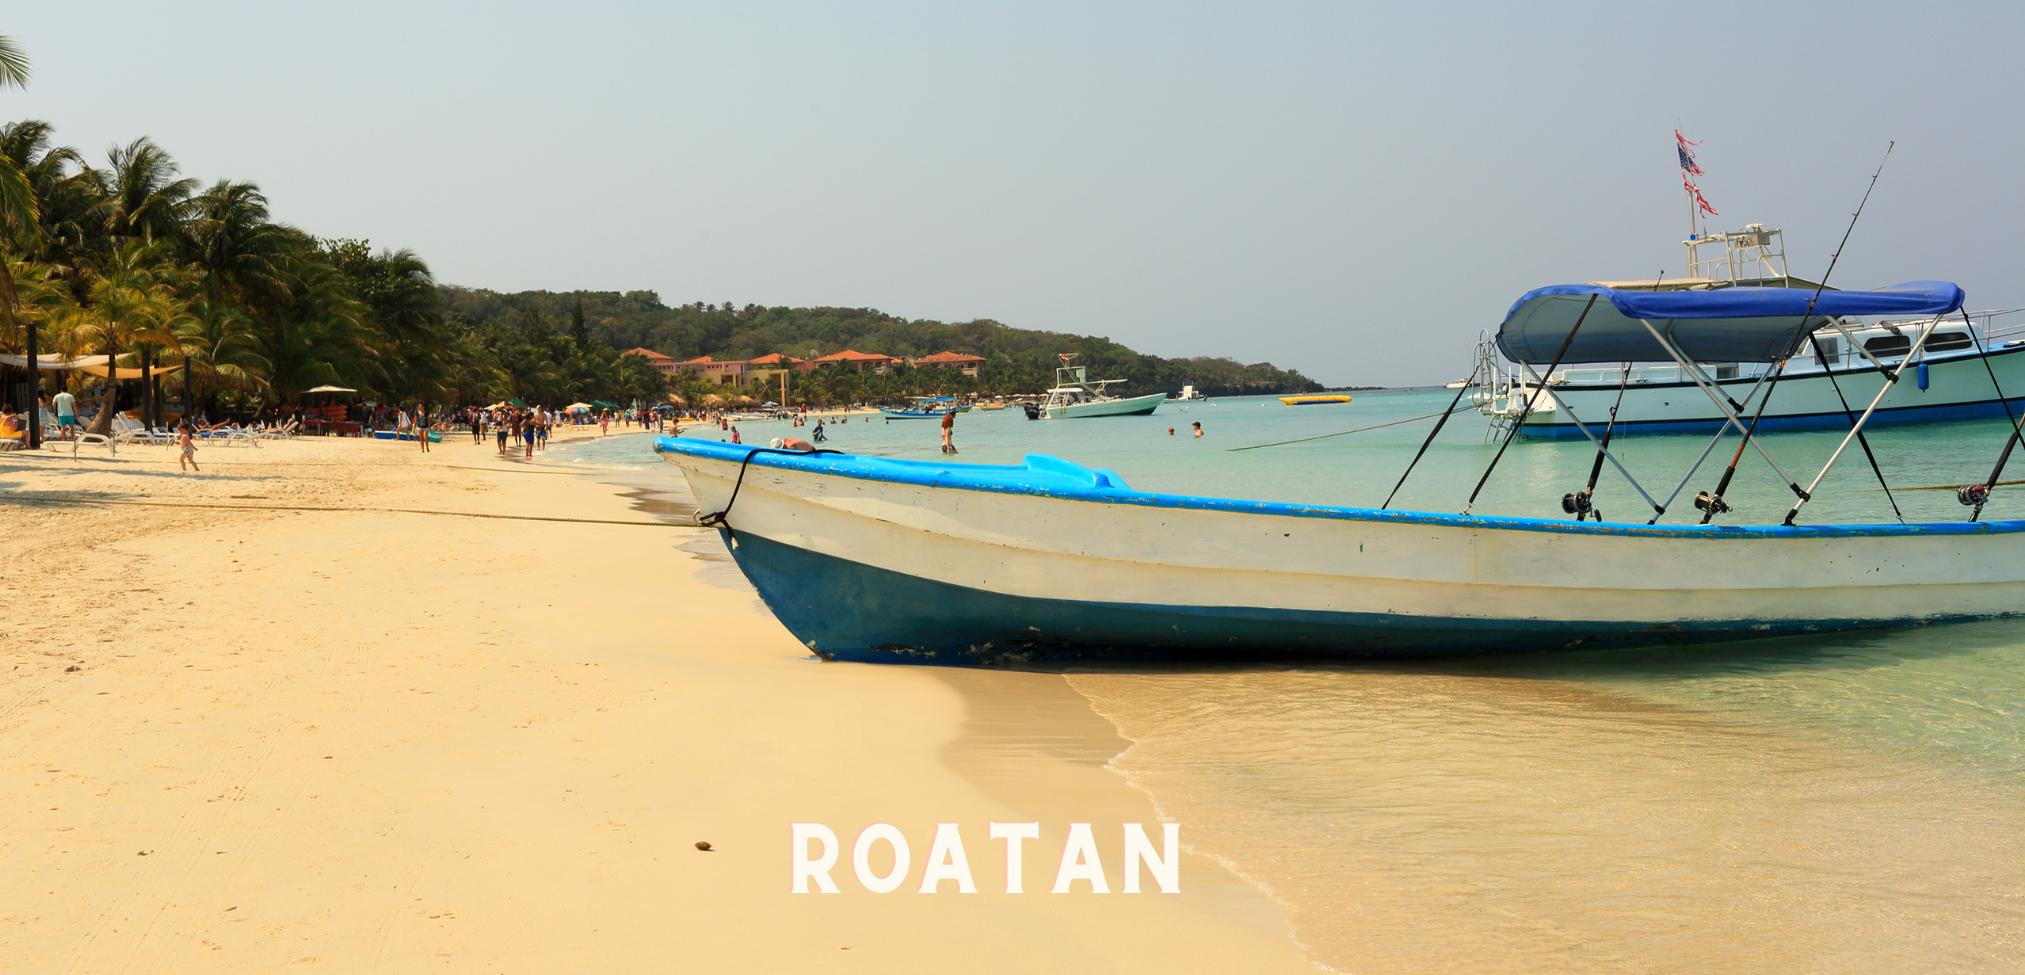 Urlaub Karibik Roatan